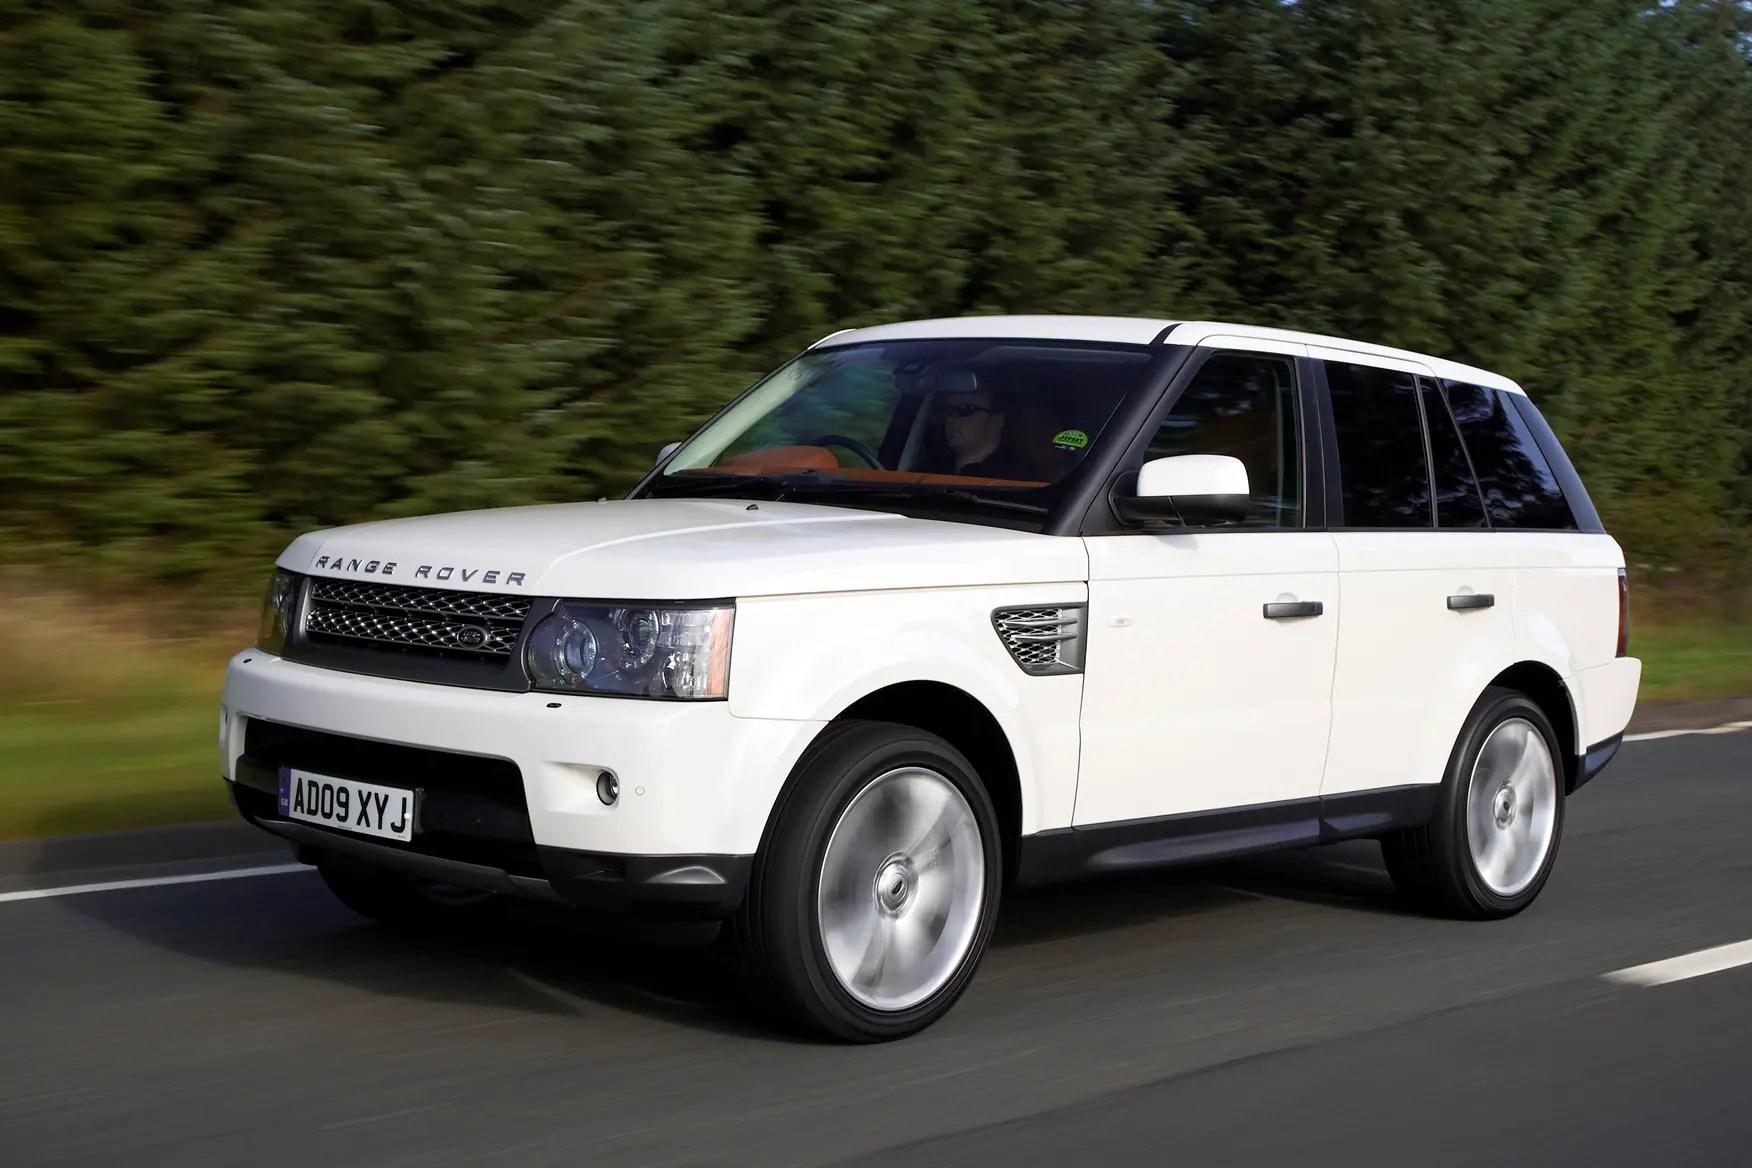 Luxury Land Rover Insurance Honda Civic And Accord